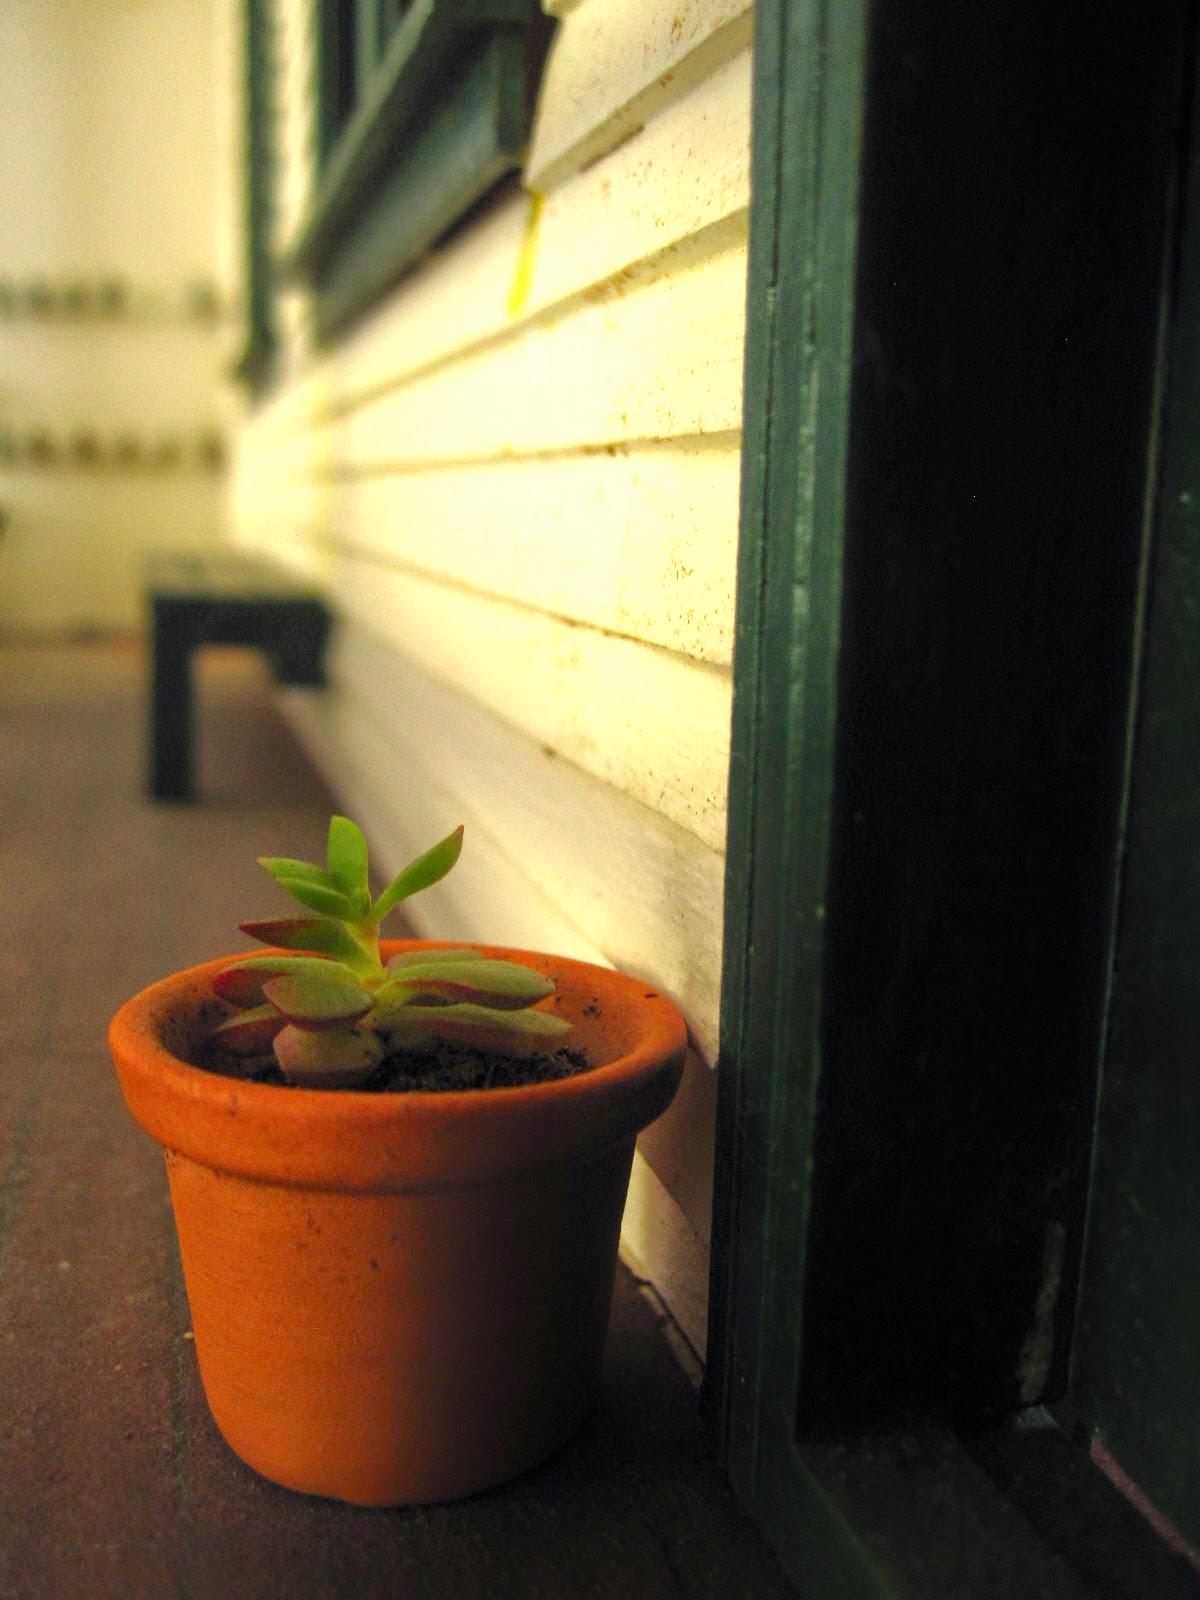 Miniature succulent in a pot on the verandah of a miniature school.